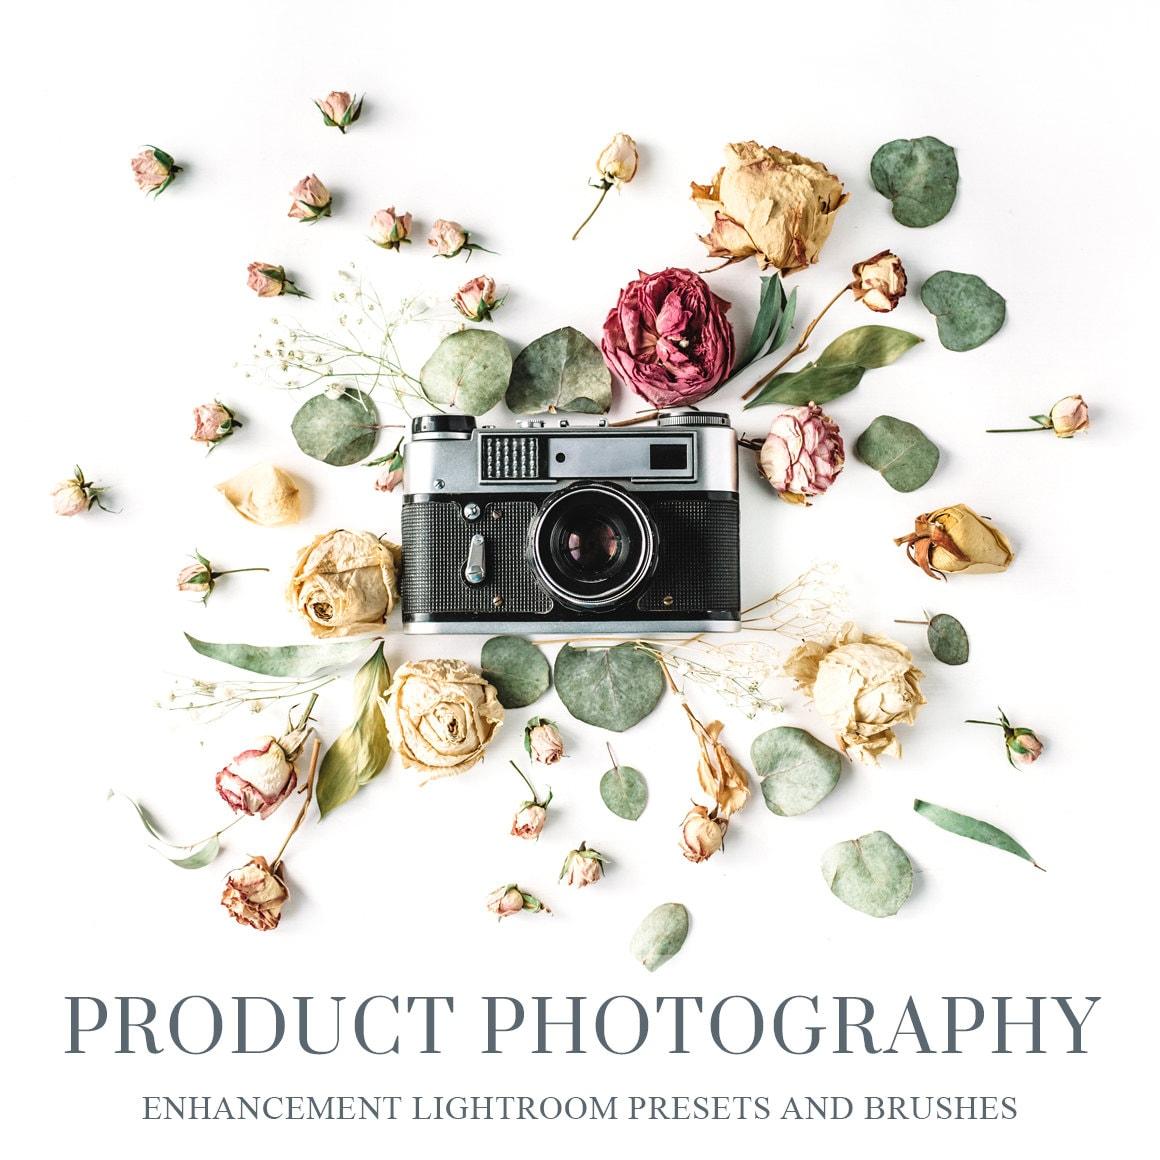 Lightroom Presets & Photography Templates von LightroomPresetBEART